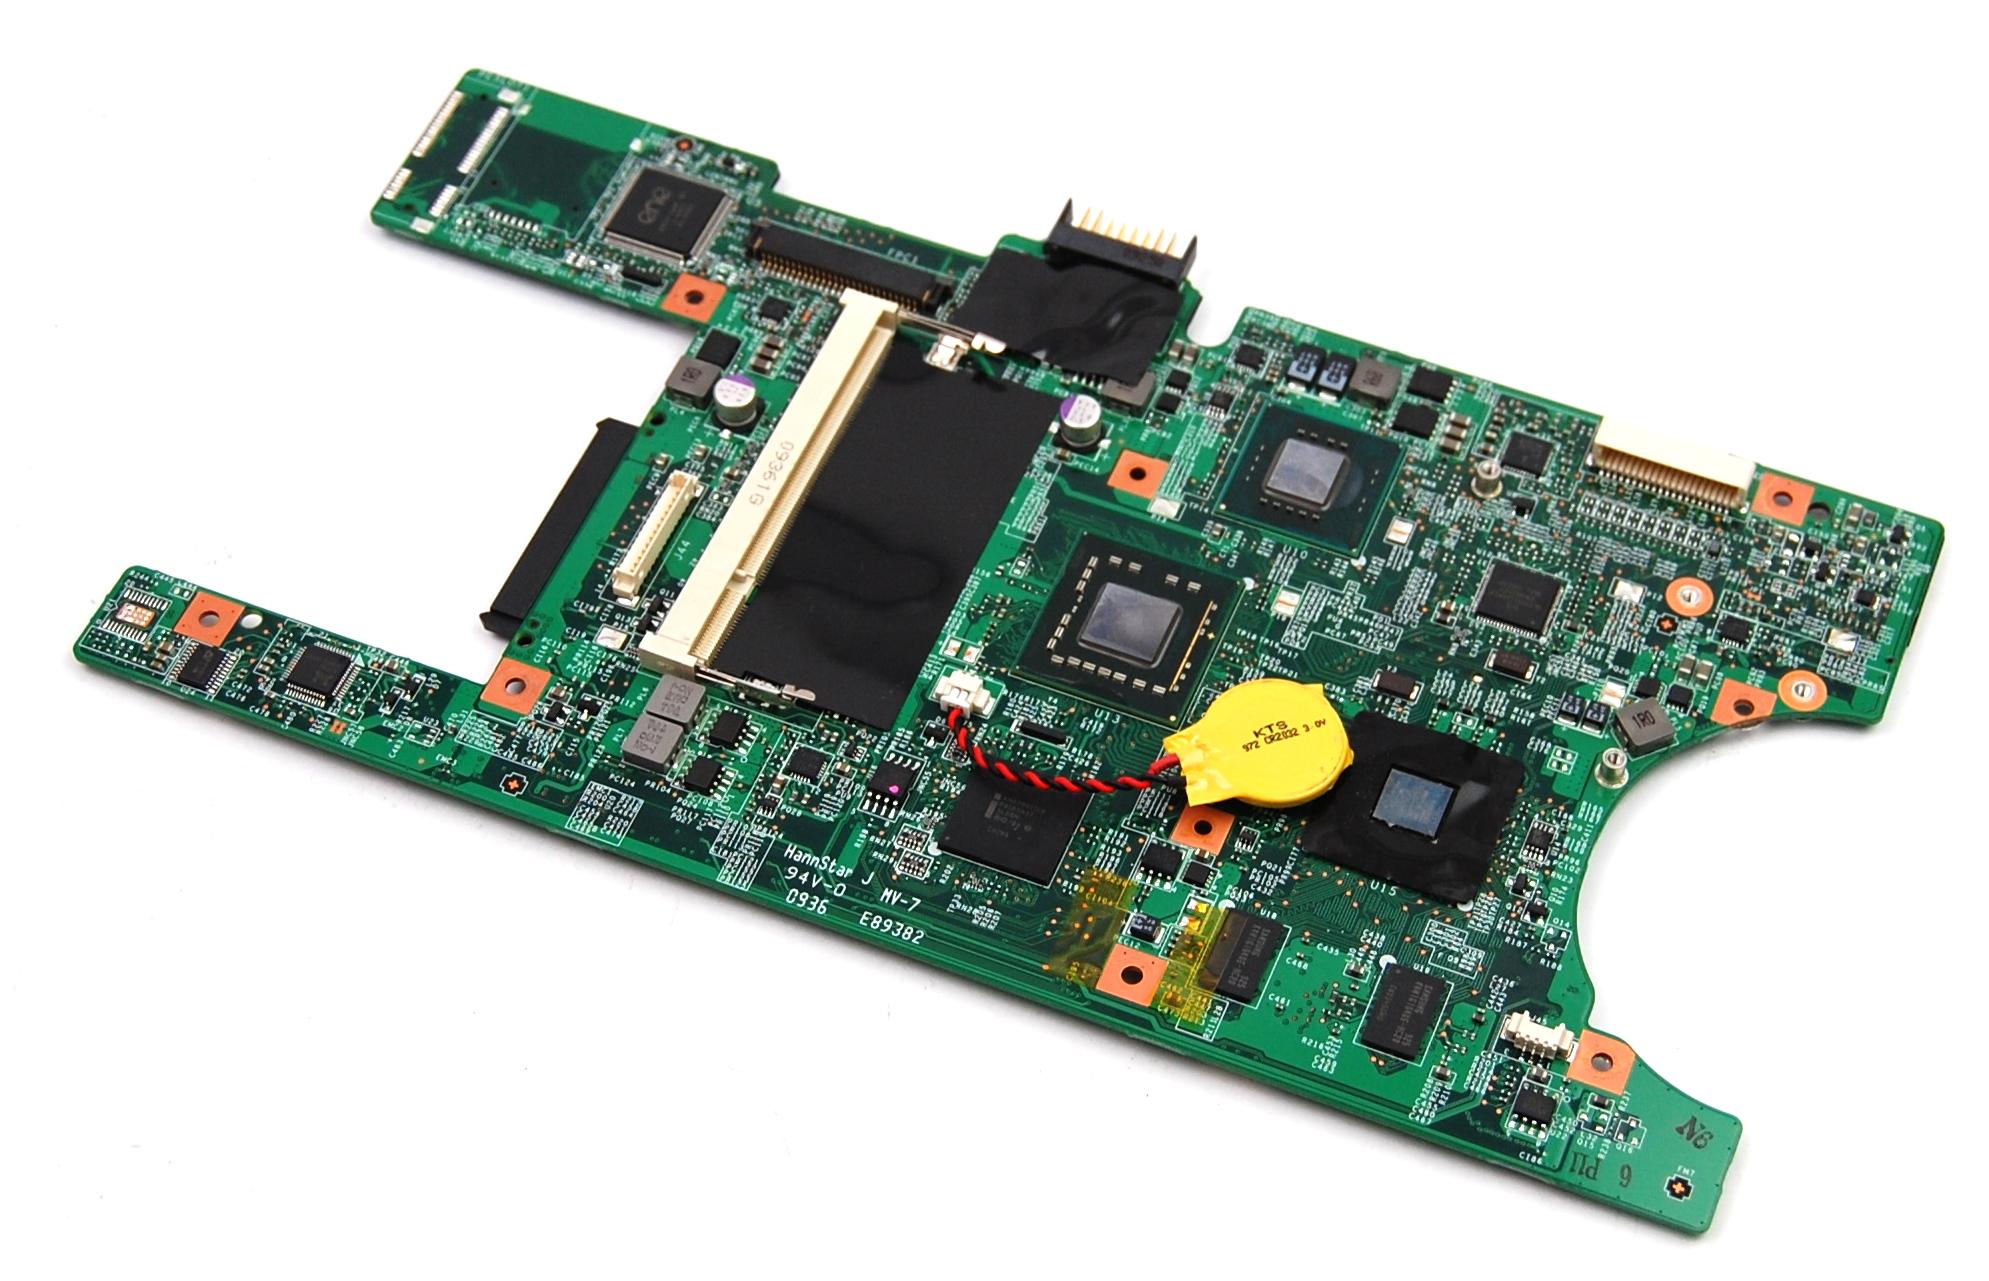 Medion MV-7 Akoya S5612 Laptop Motherboard with Mobile Celeron Dual-Core SU2300